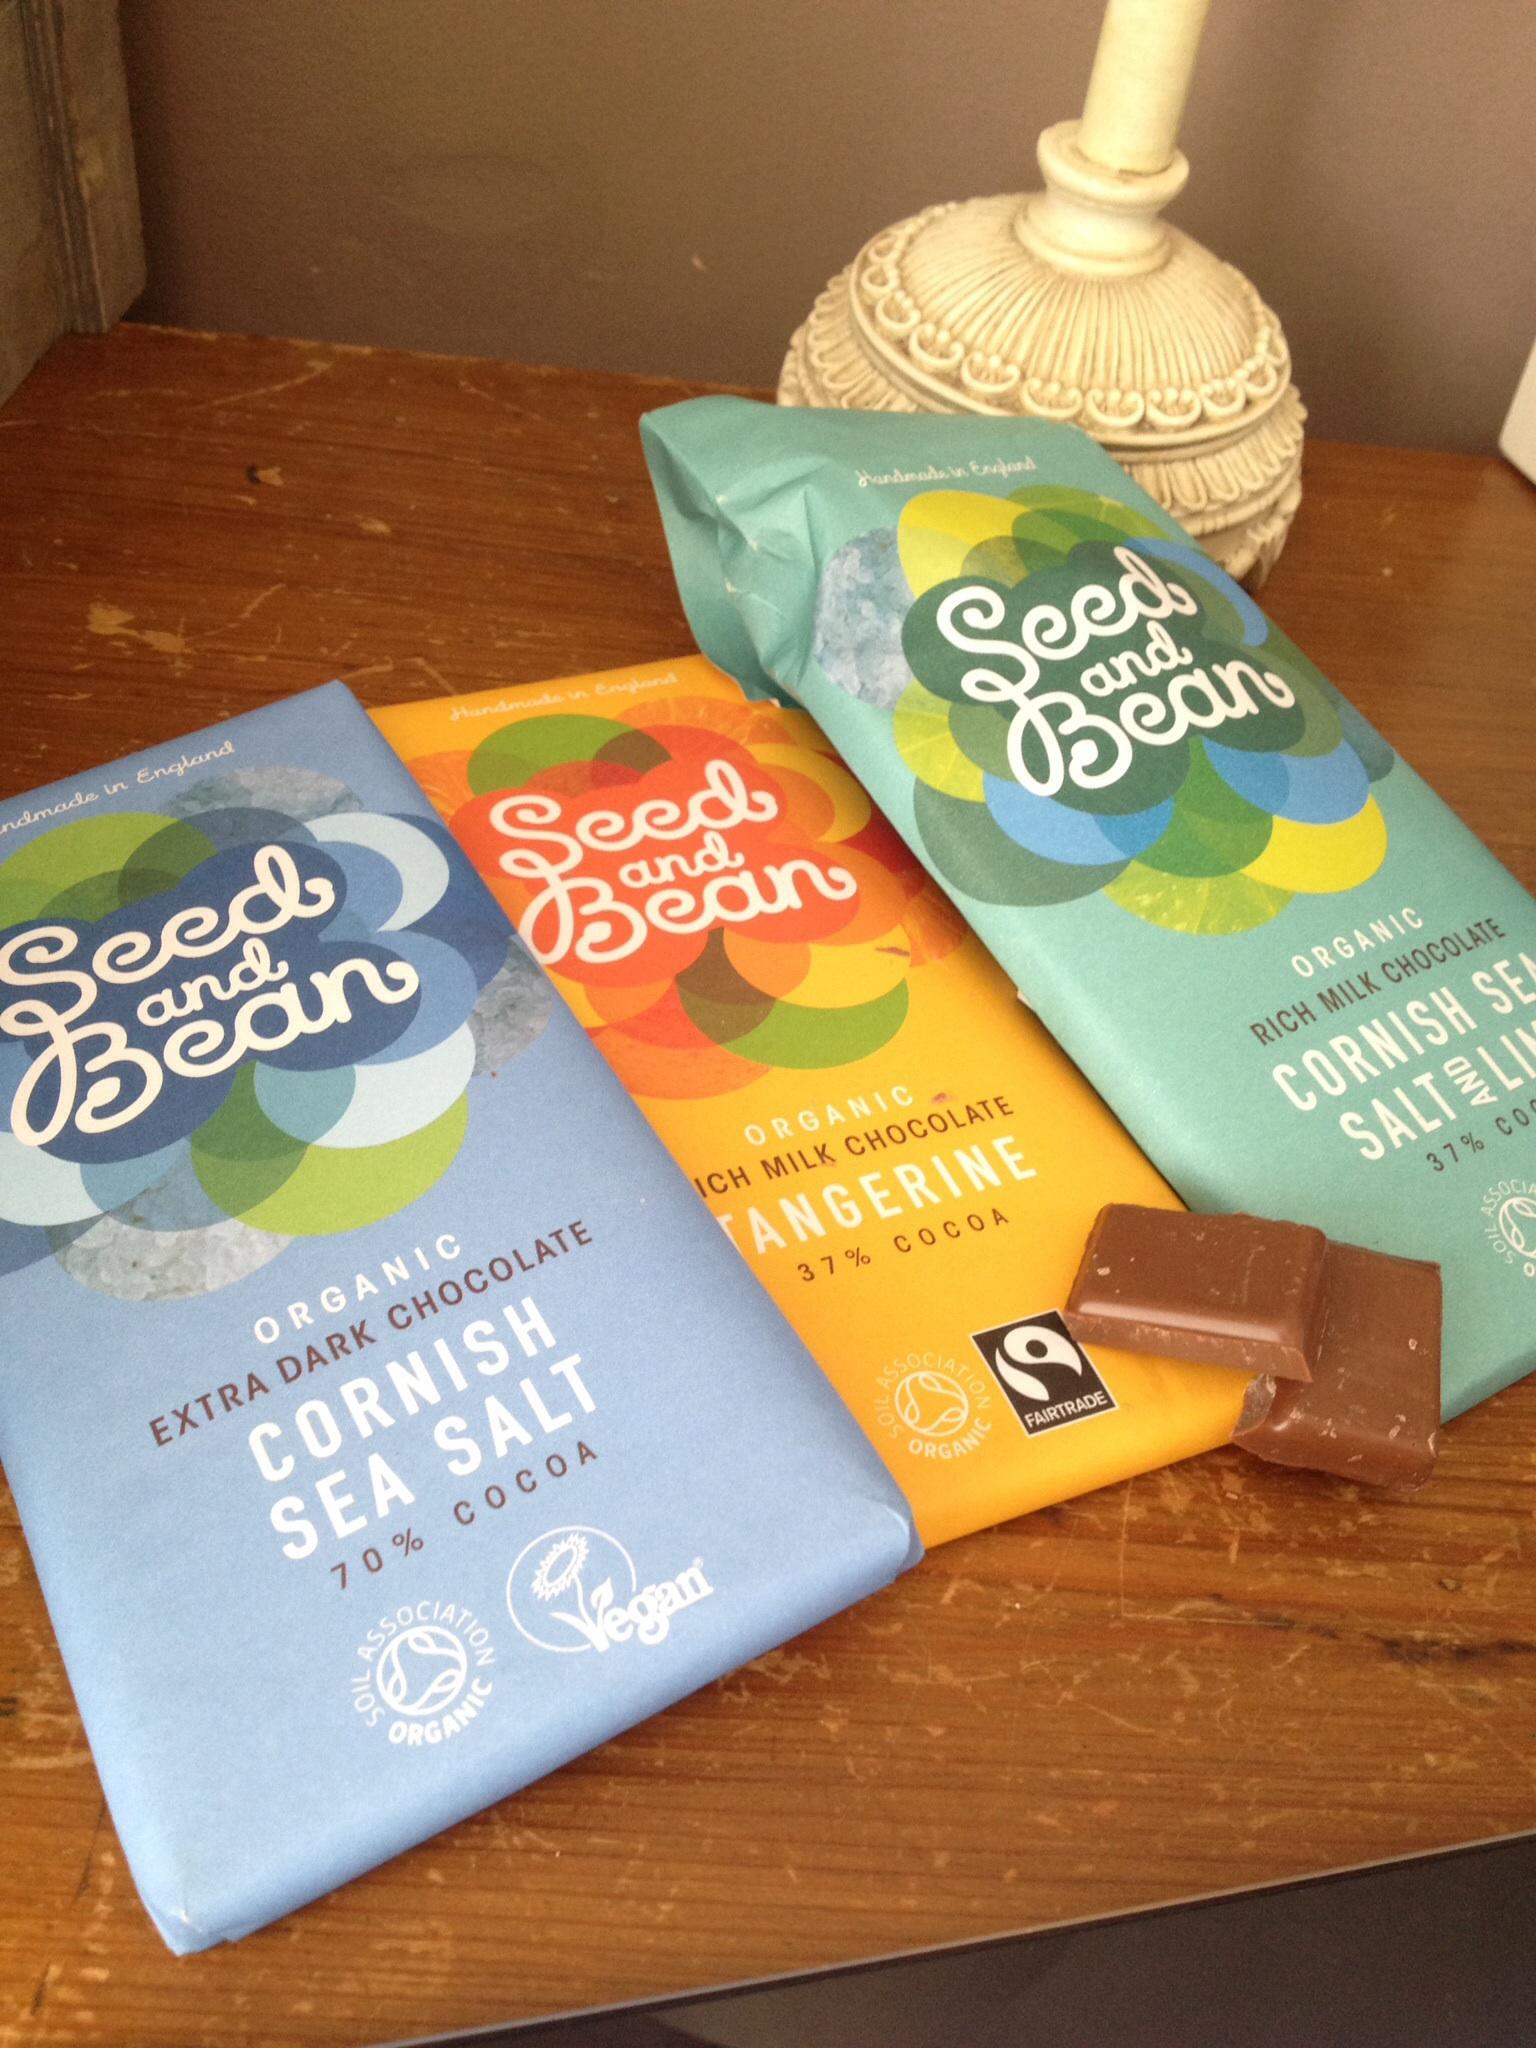 Seed and bean chocolate